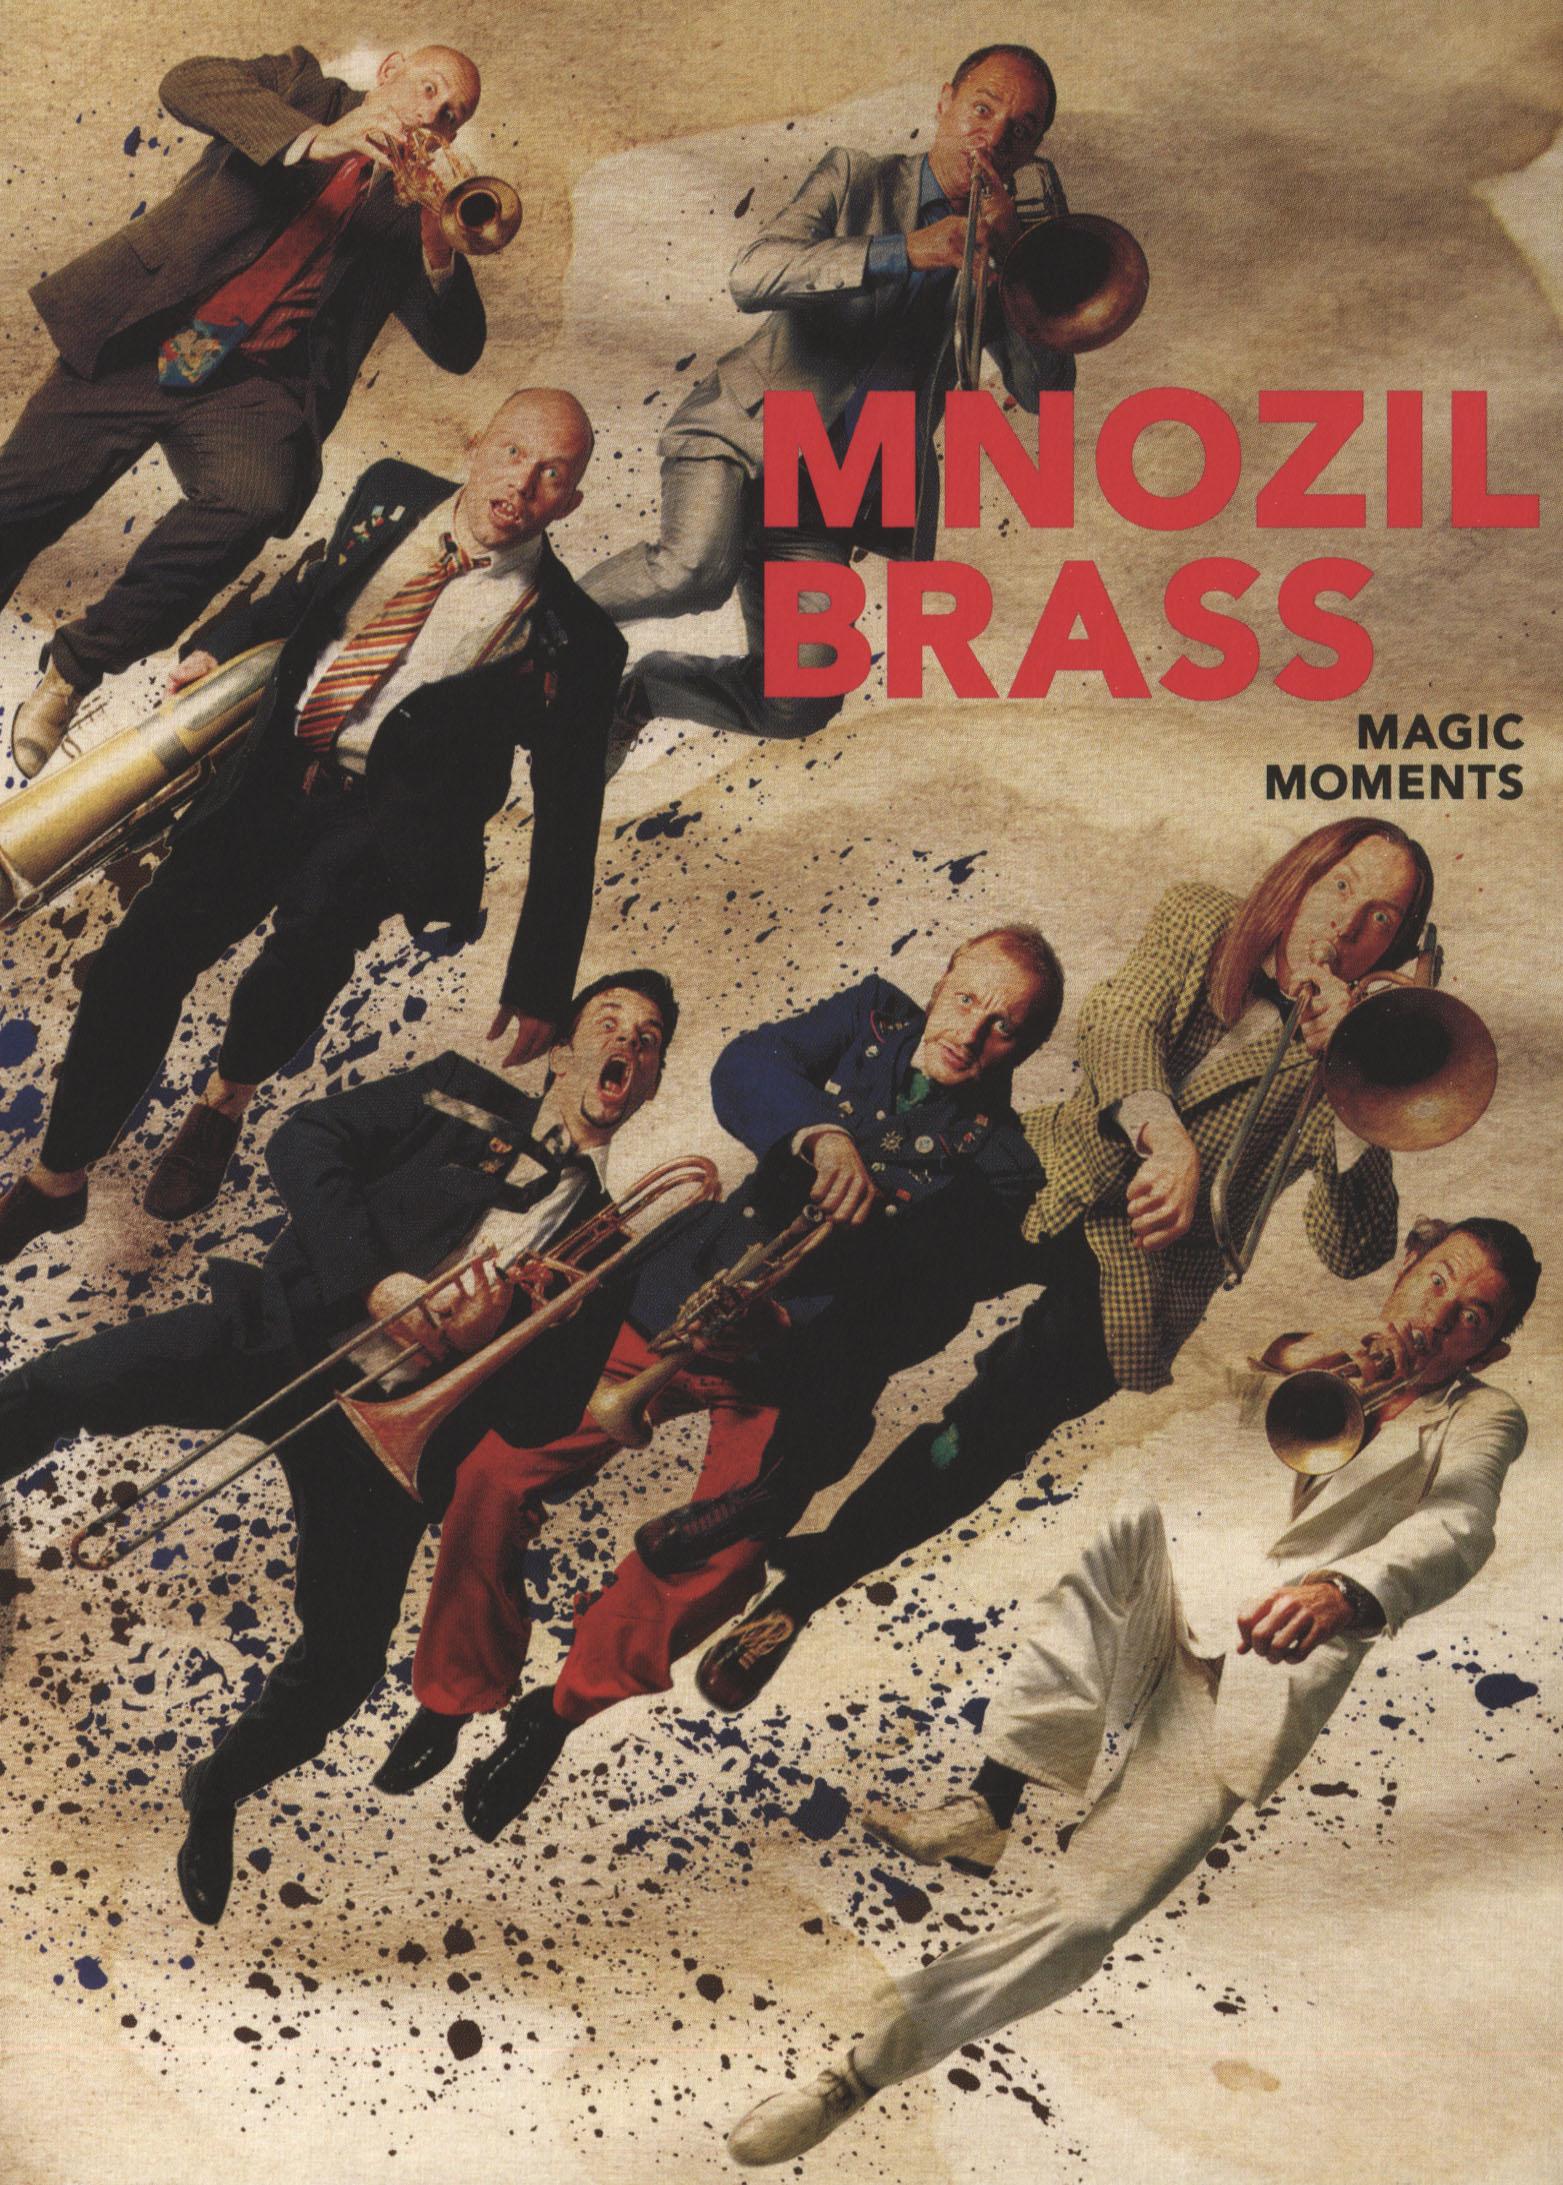 Mnozil Brass: Magic Moments